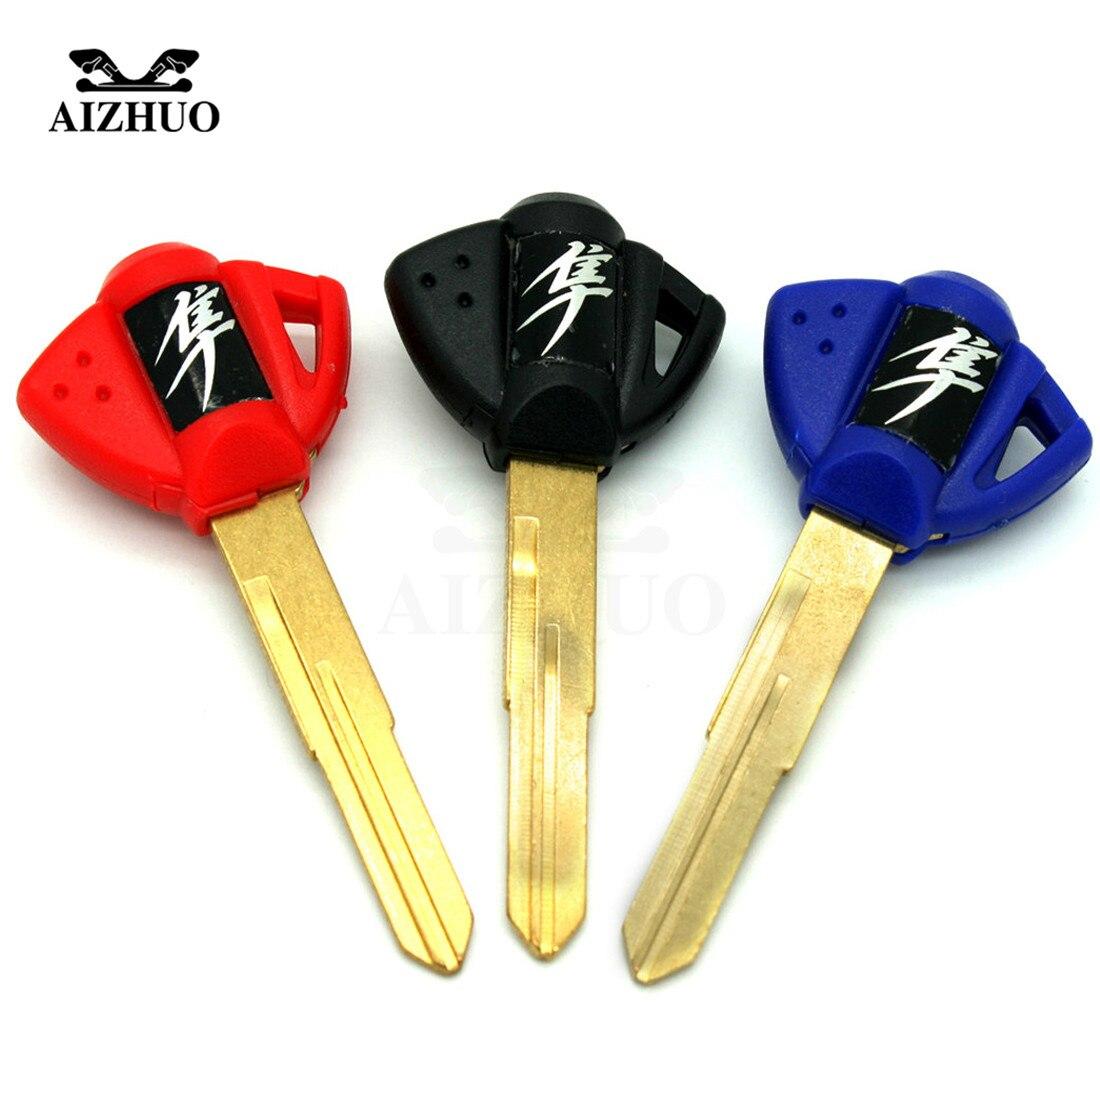 Motorcycle keys Key rings Embryo Uncut Keyring  For Suzuki GSXR1300 GSX 1300 GSX-R 1300 2008 2009 2010 2011 2012 2013 2014 2015